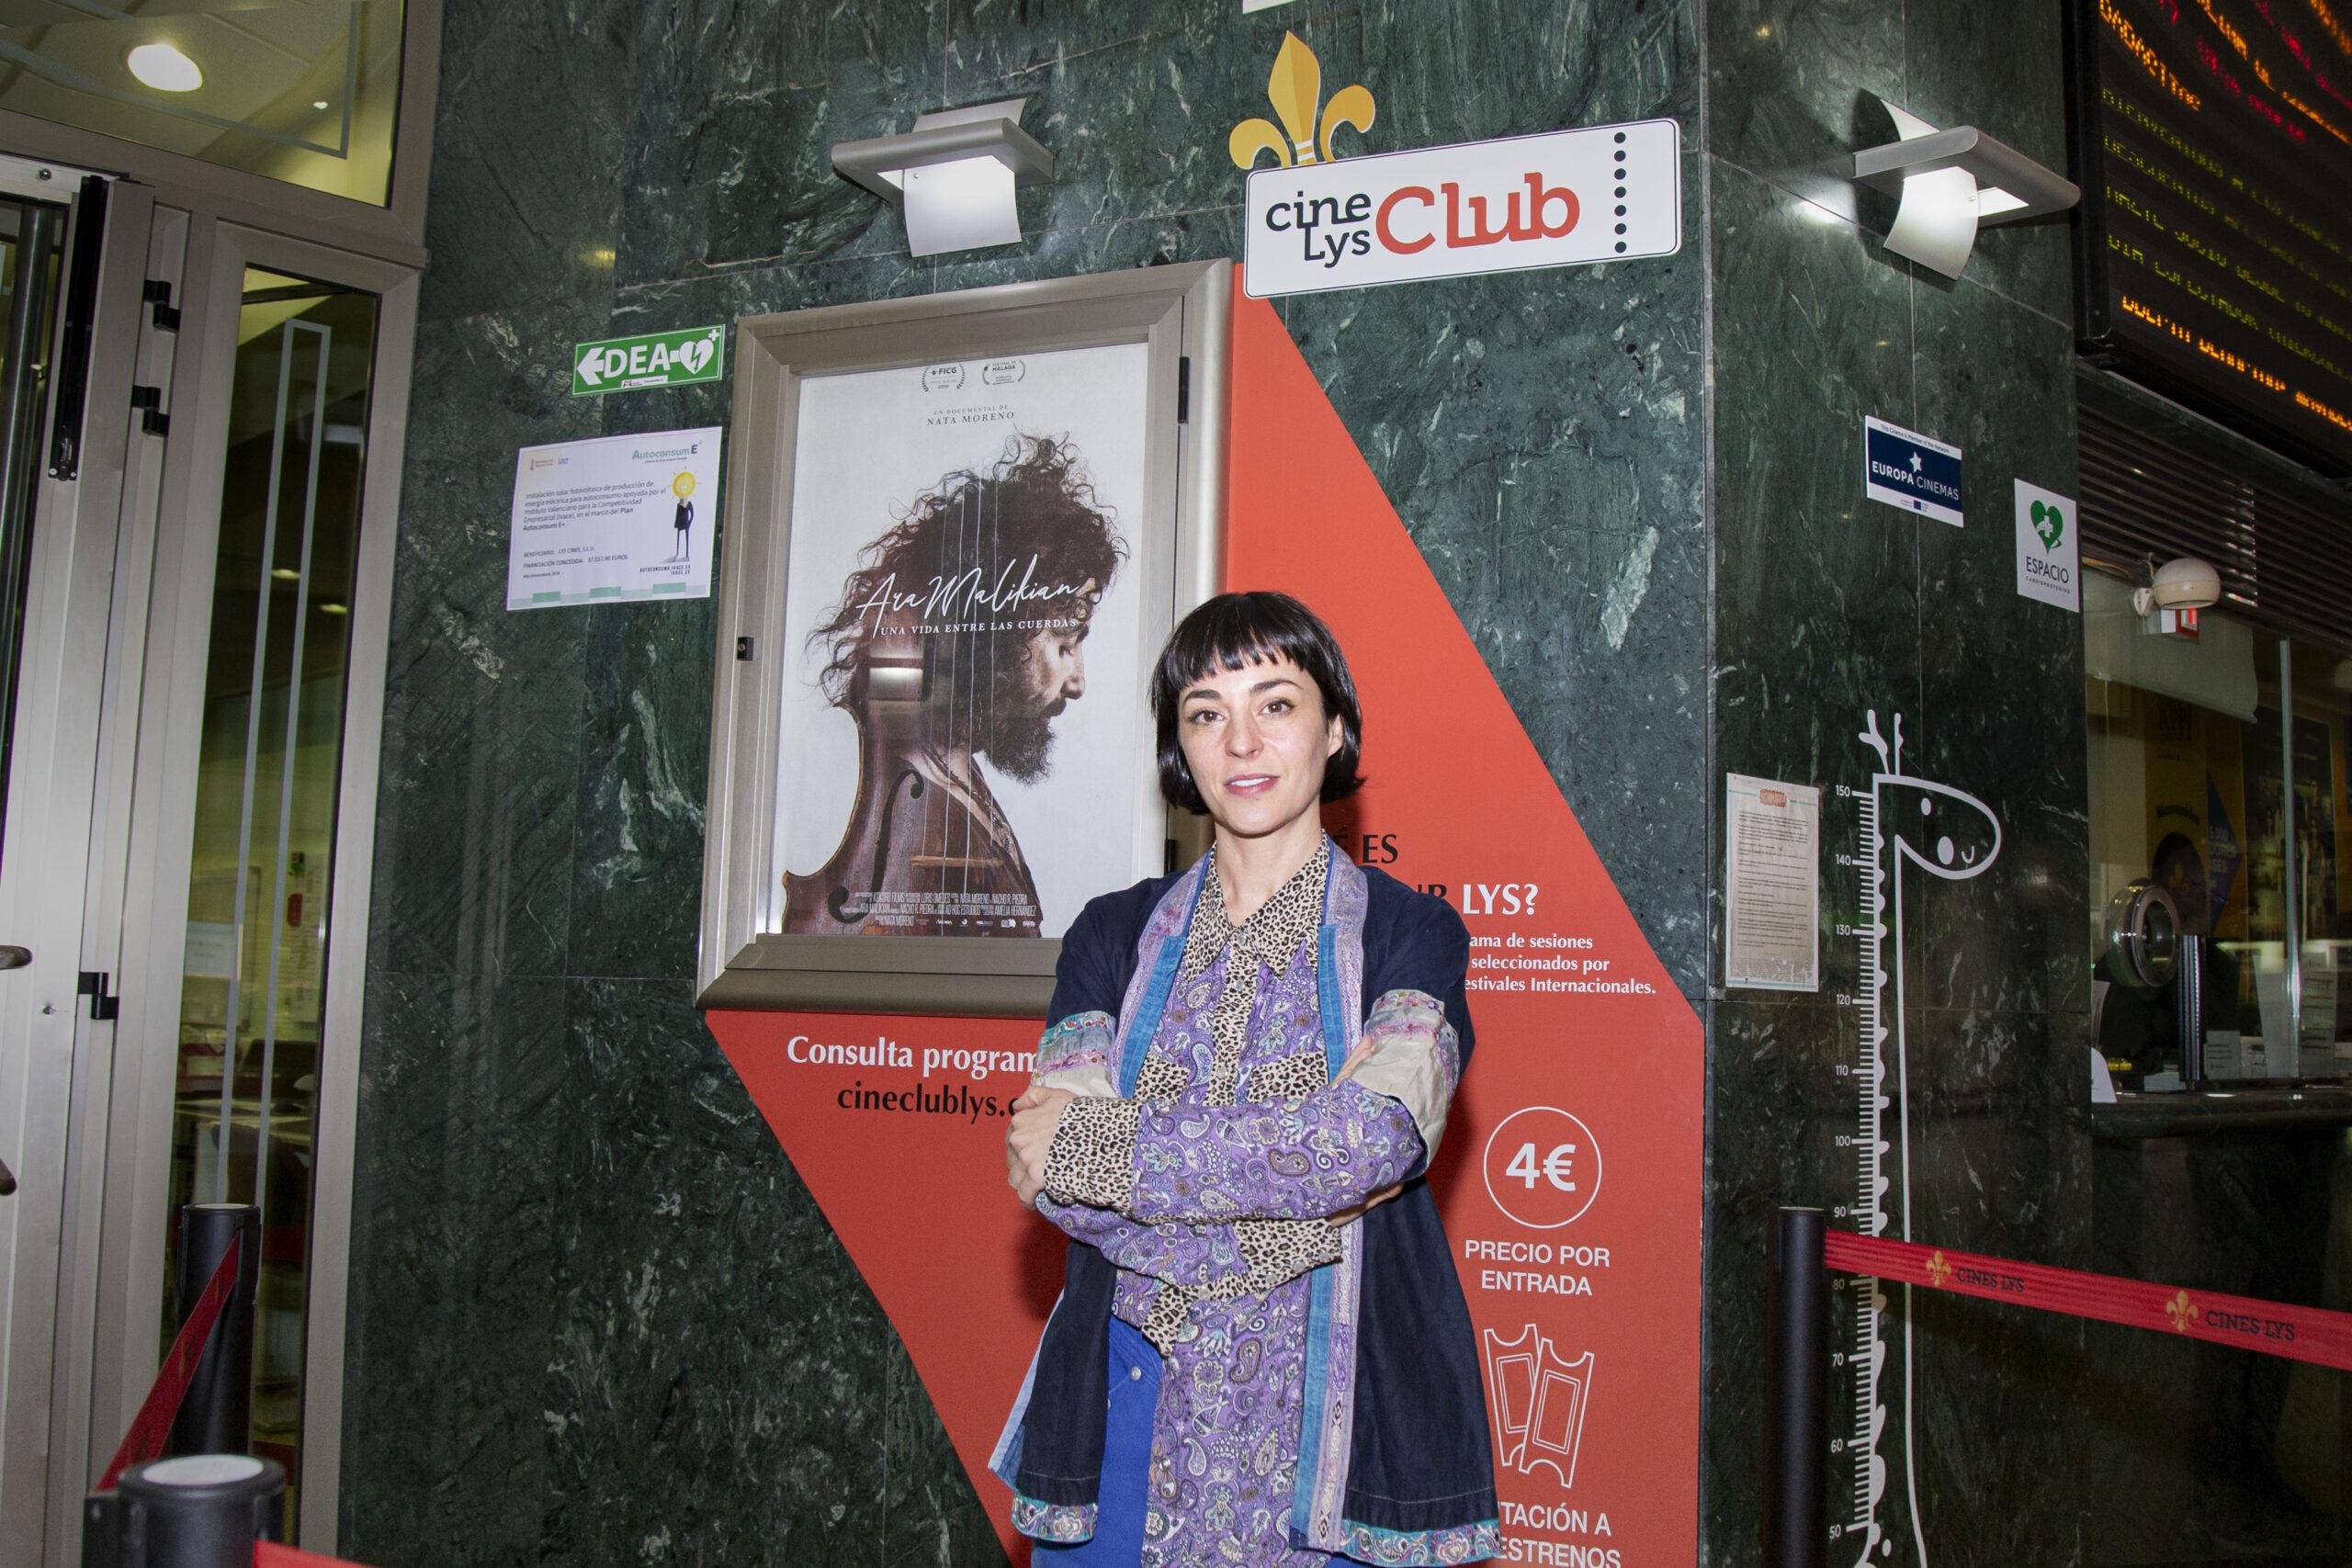 Cine Club Lys - Ara Malikian